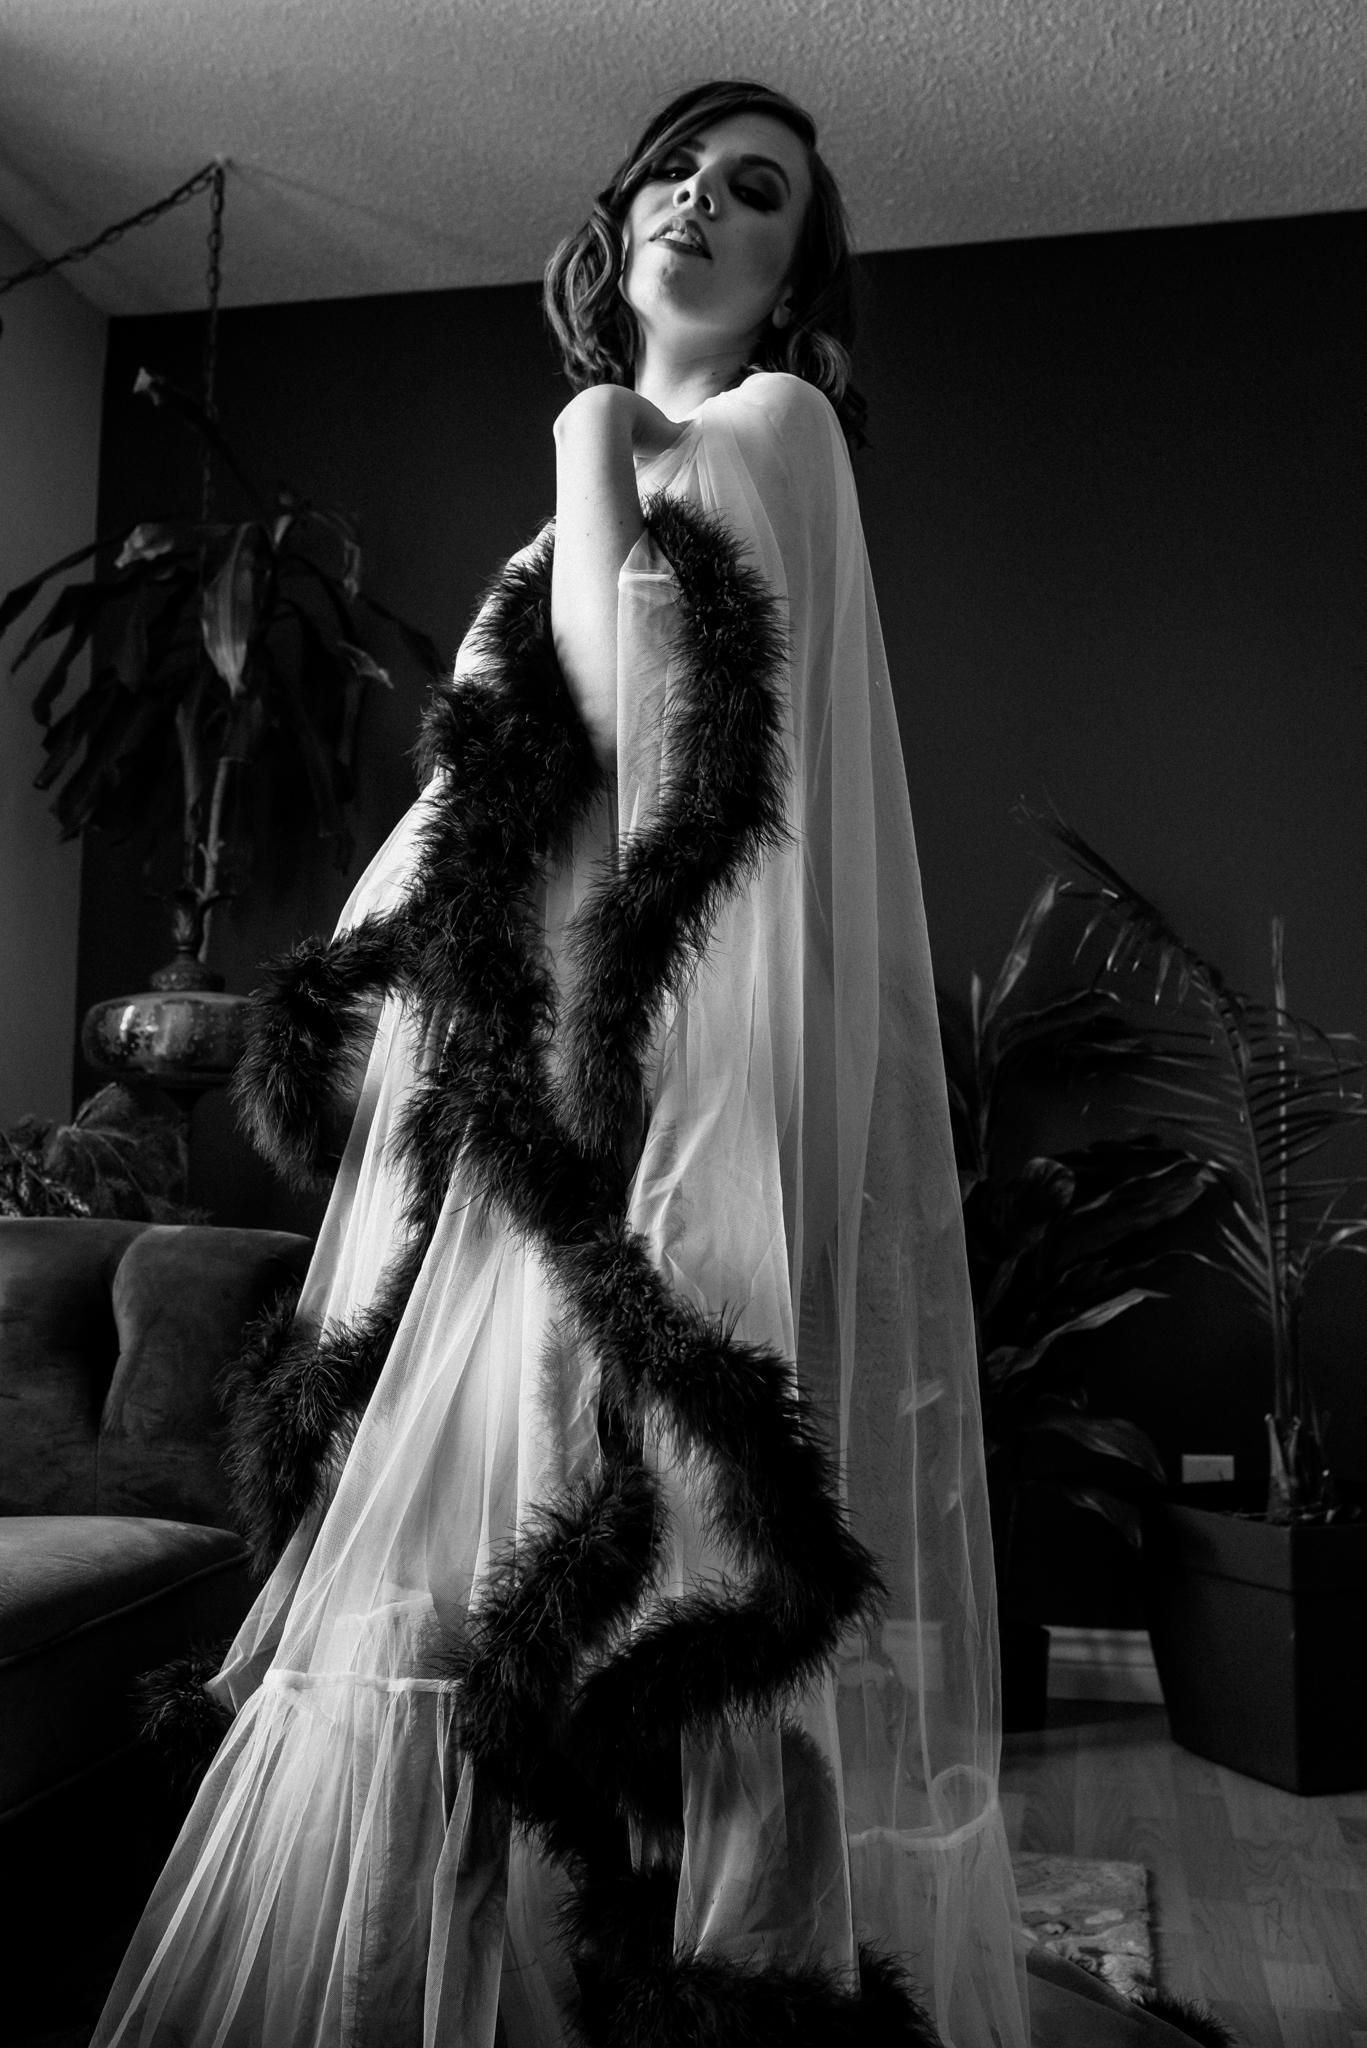 Boudoir, Calgary Photographer, Artist Shannon Smith, Empowerment, Portrait Photography, Fine Nude Art, Body Positive Boudoir